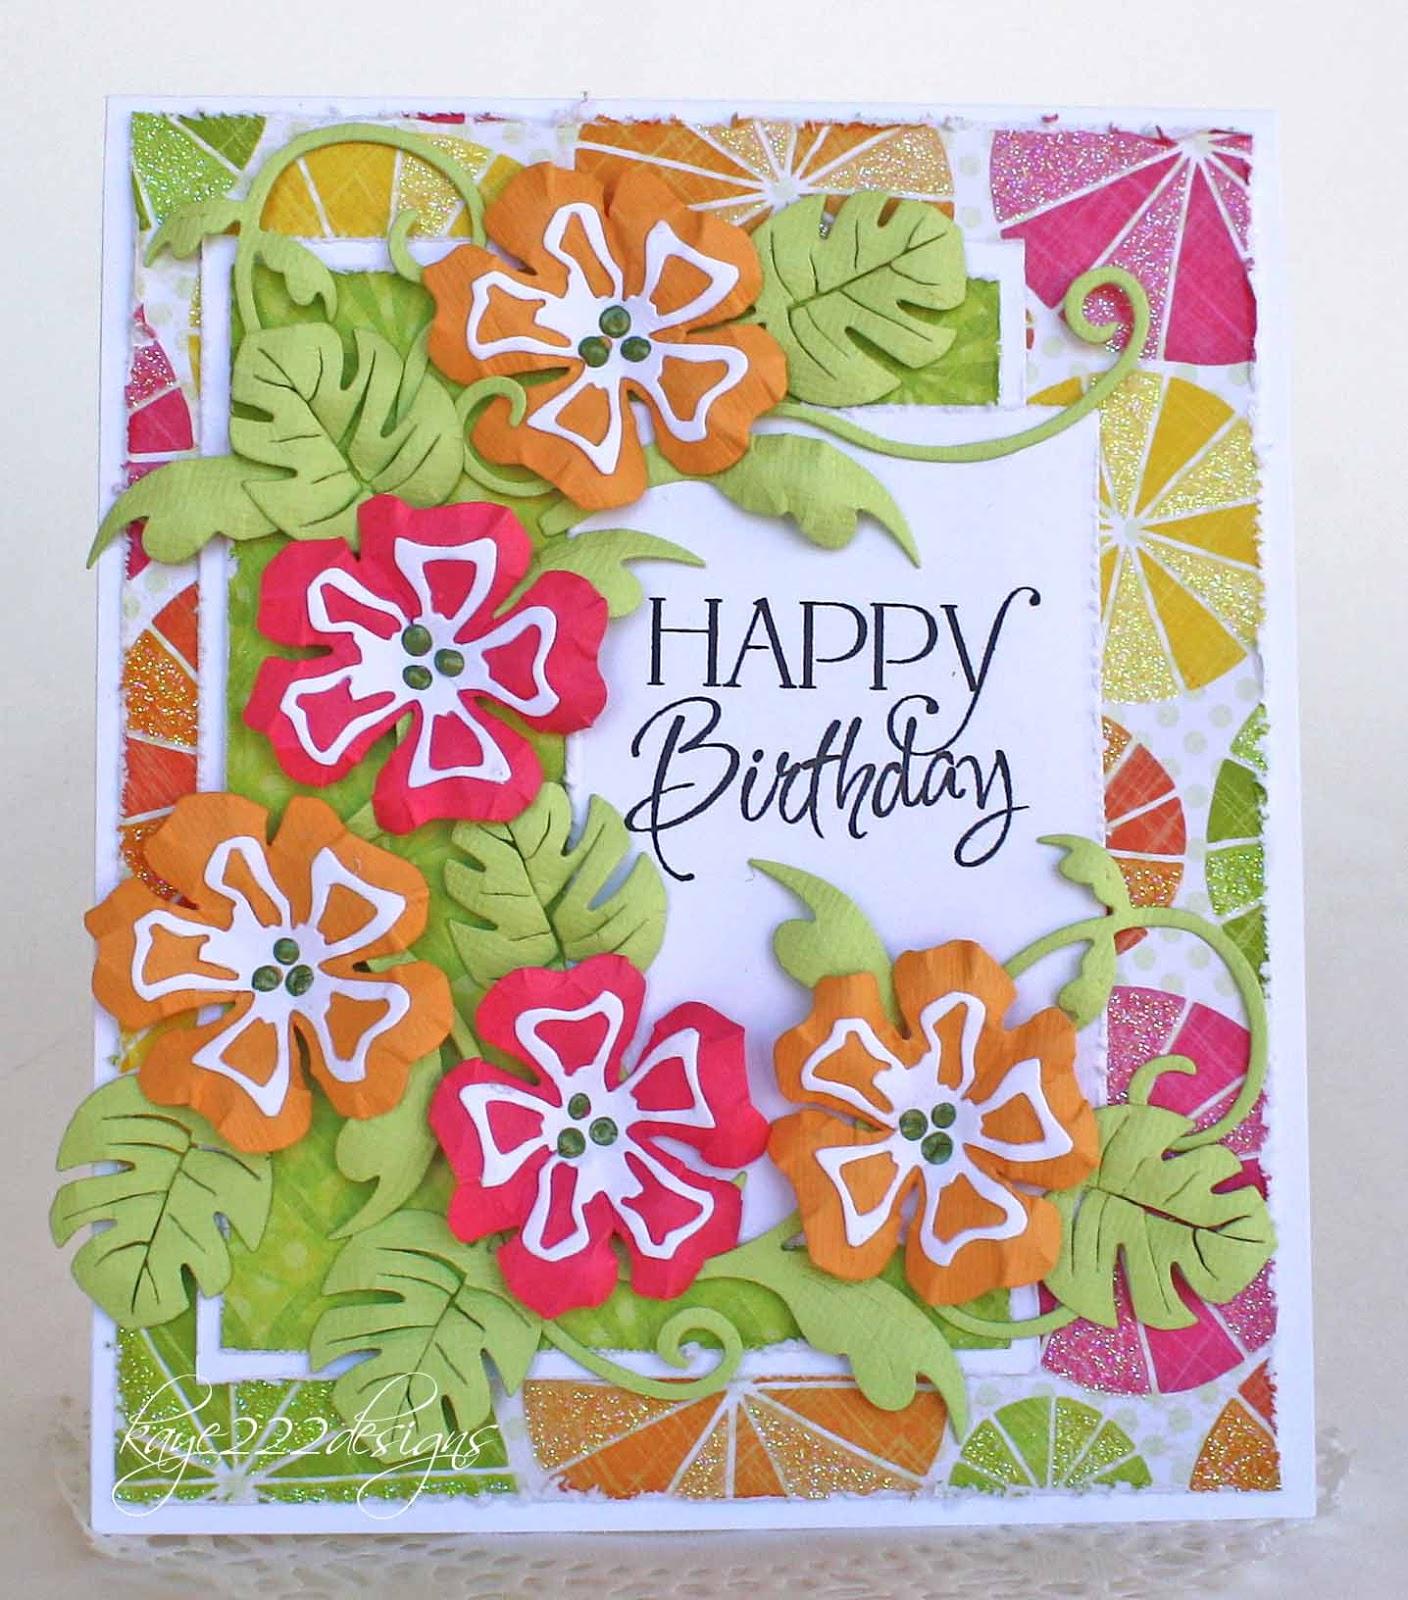 Beyond Beauty: Happy Birthday! With Cheery Lynn Designs